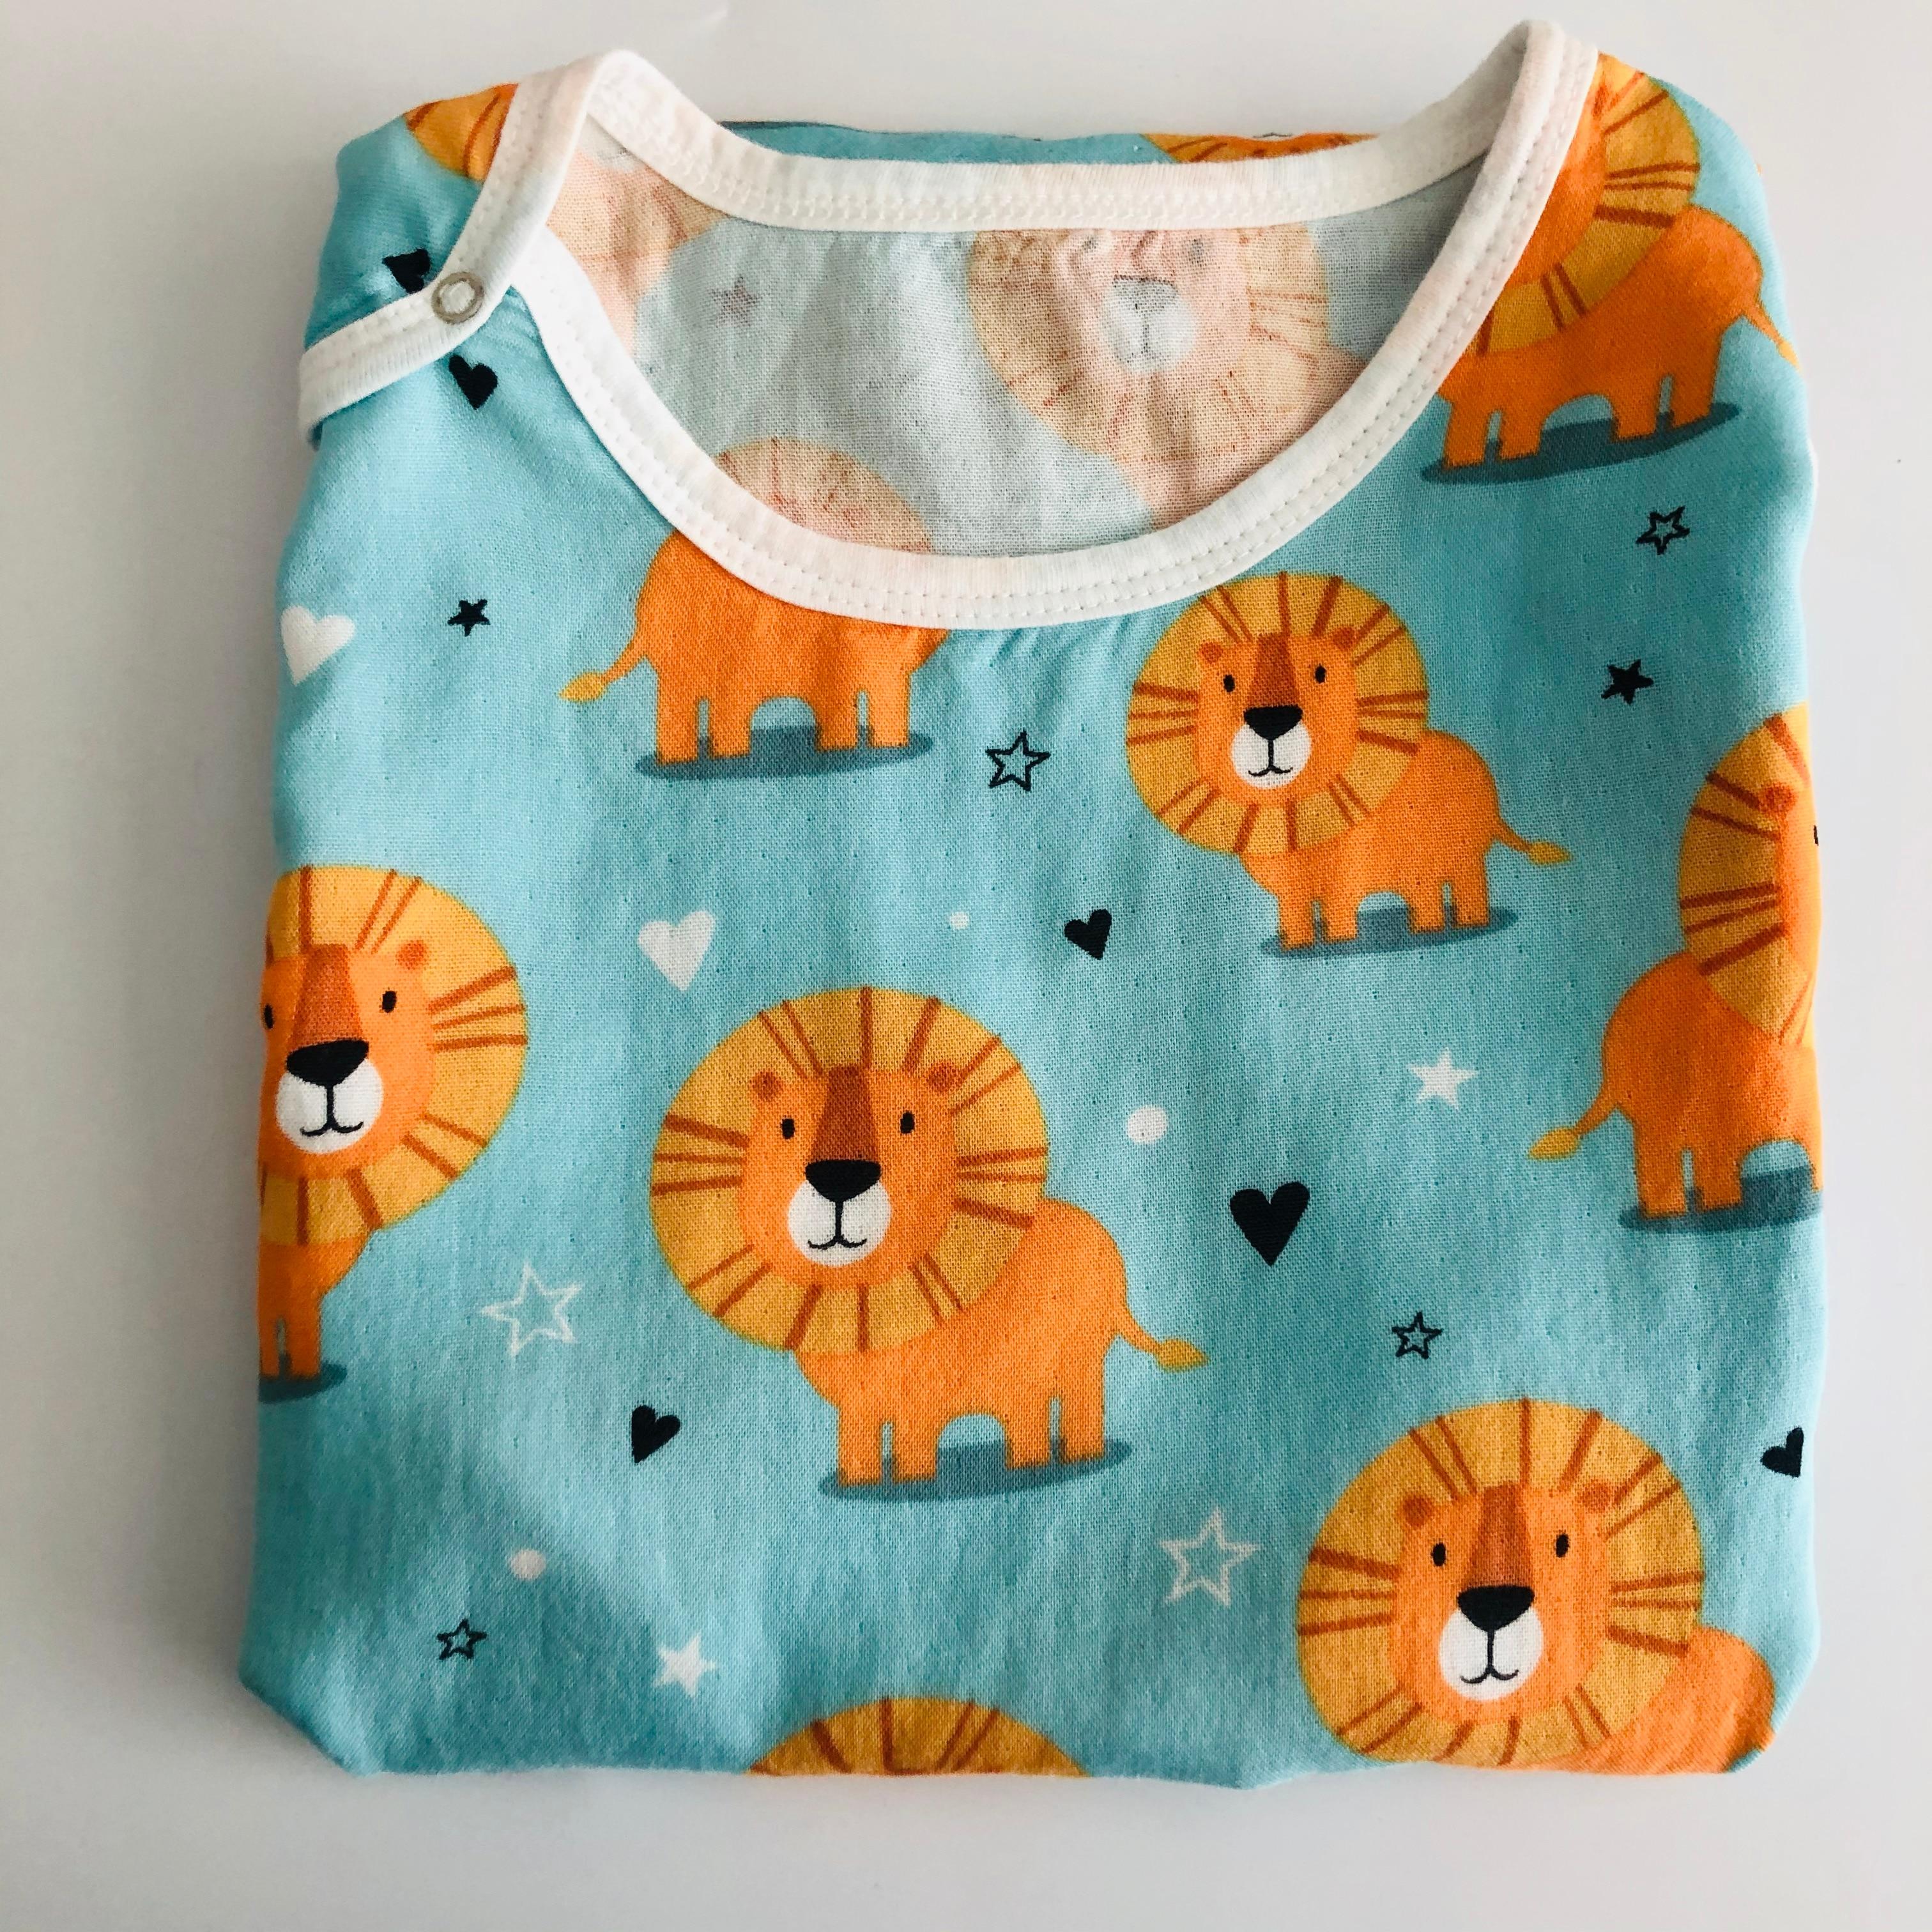 1layer70% Bamboo+30% Cotton Newborn Sleeveless Baby Sleeping Bag Cartoon Bear Muslin Kids Warm Sleeping Bag Printing Pattern S2